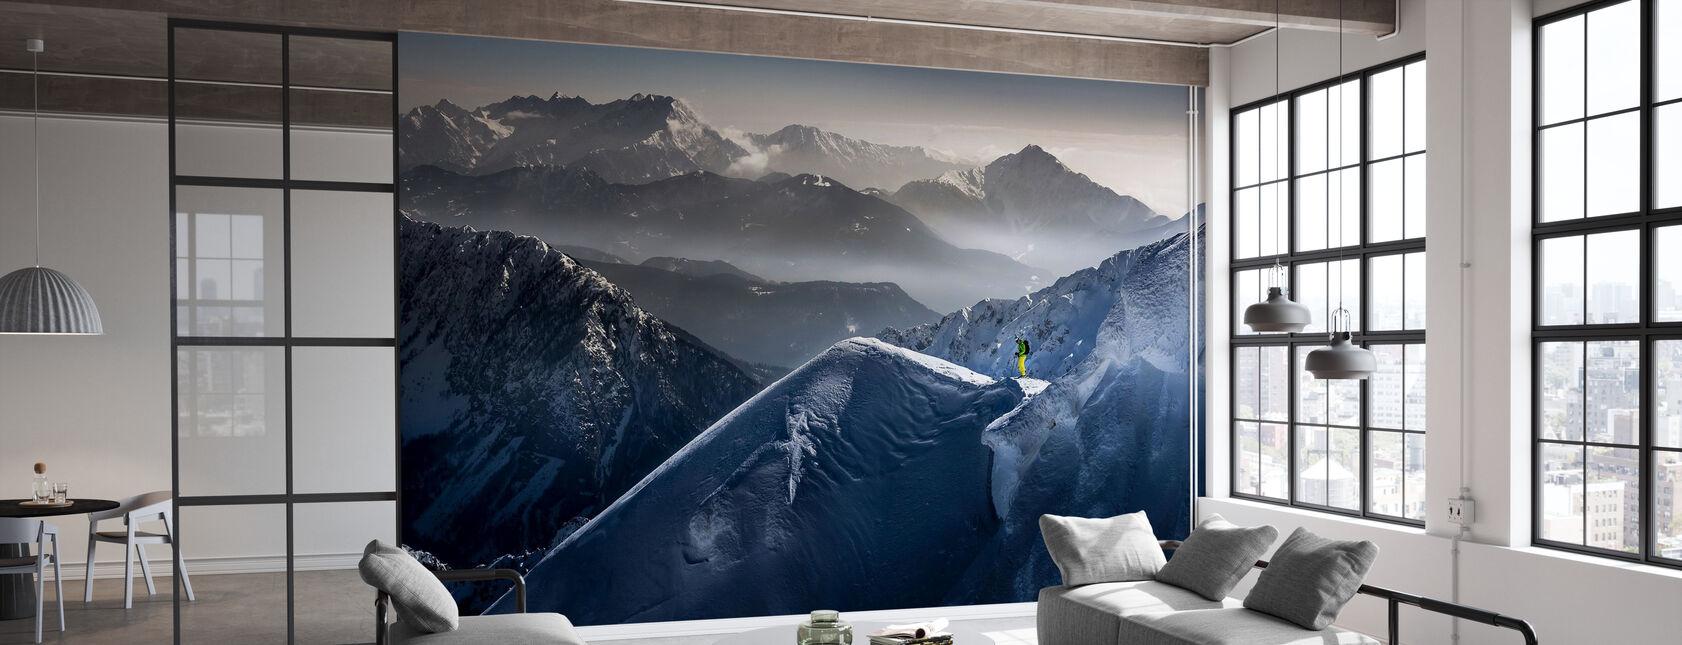 Skiër op Mountain Top - Behang - Kantoor